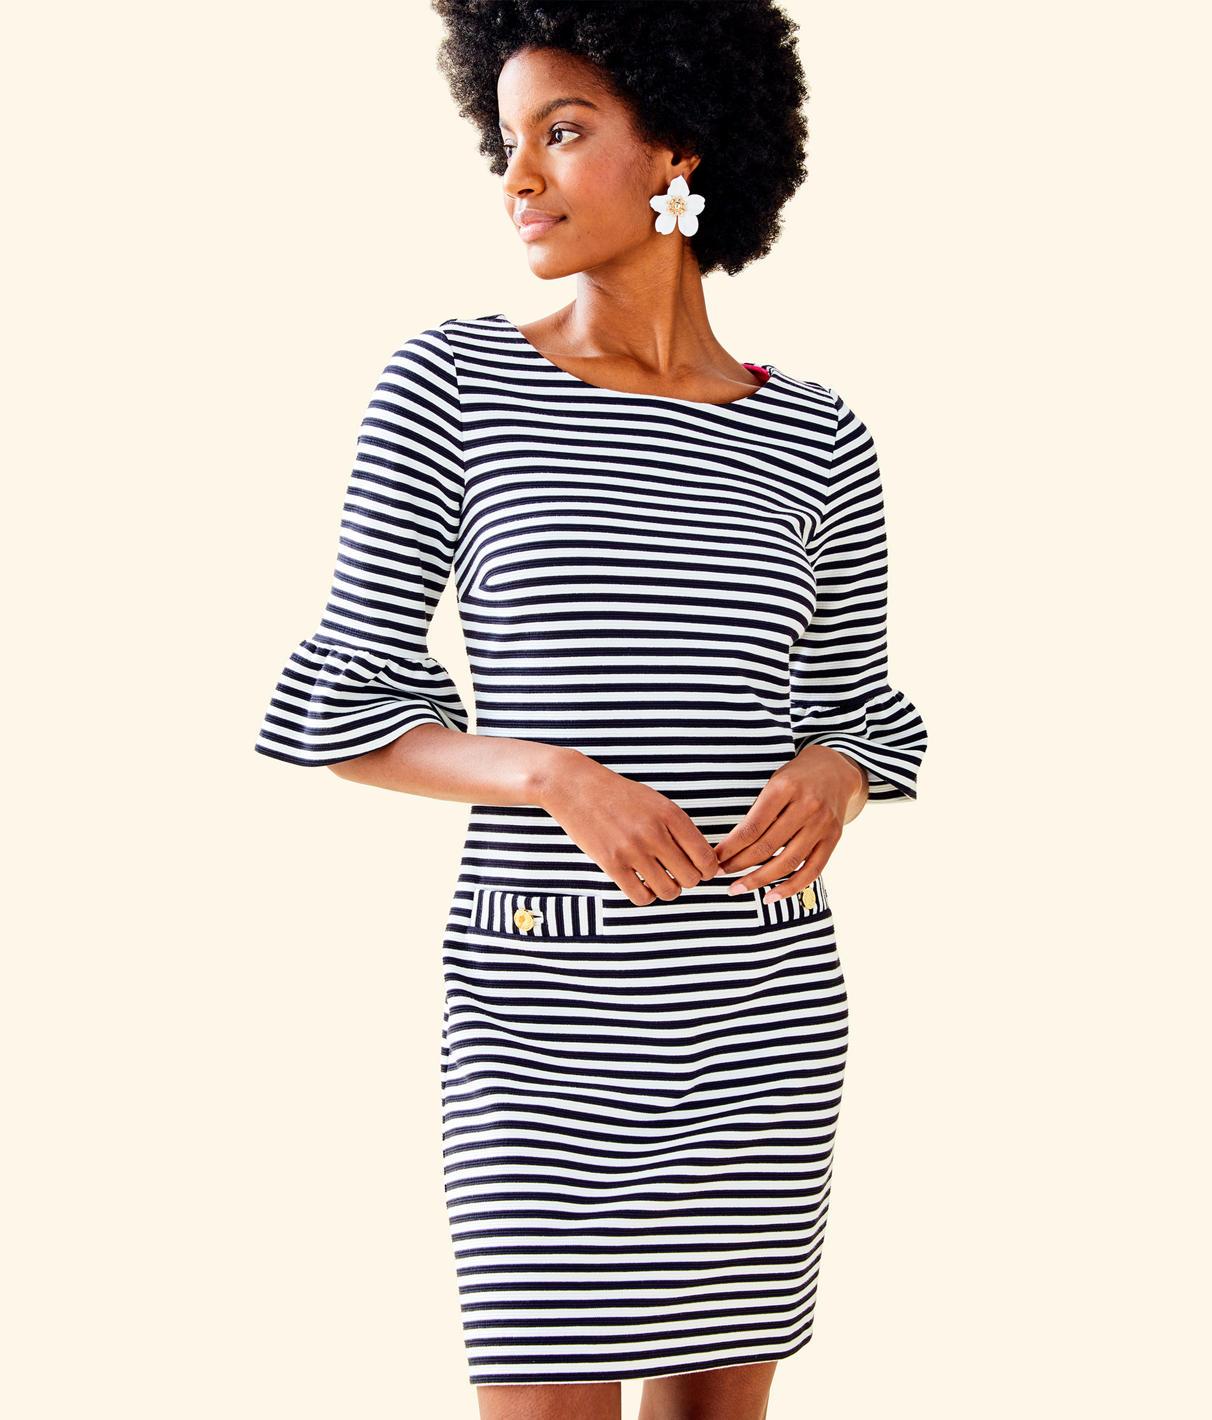 Alden Bell-Sleeve Stripe Dress in Coconut Ottoman Stripe from Lilly Pulitzer